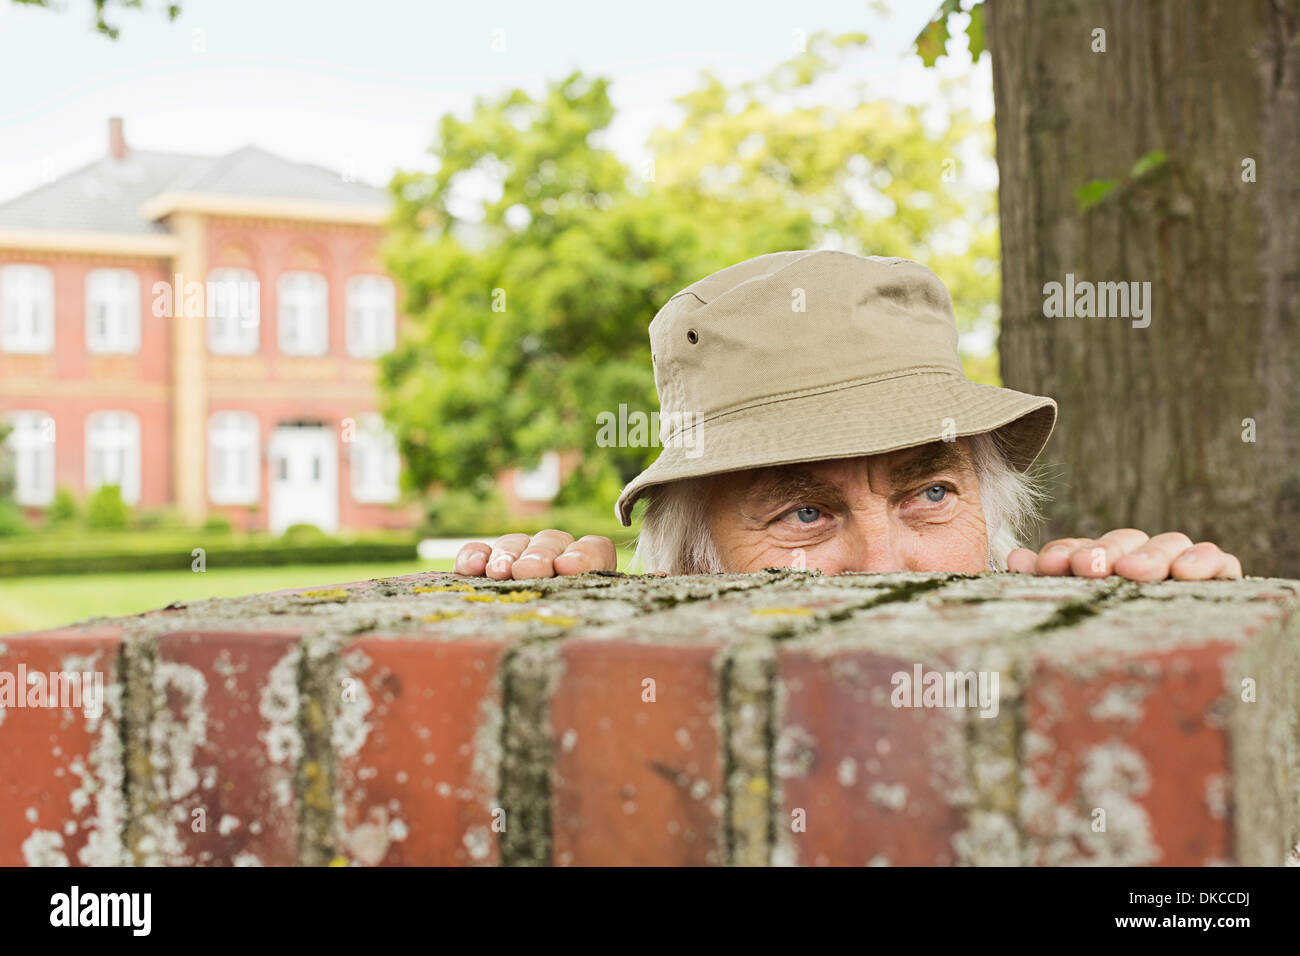 Senior man wearing hat peering over garden wall - Stock Image